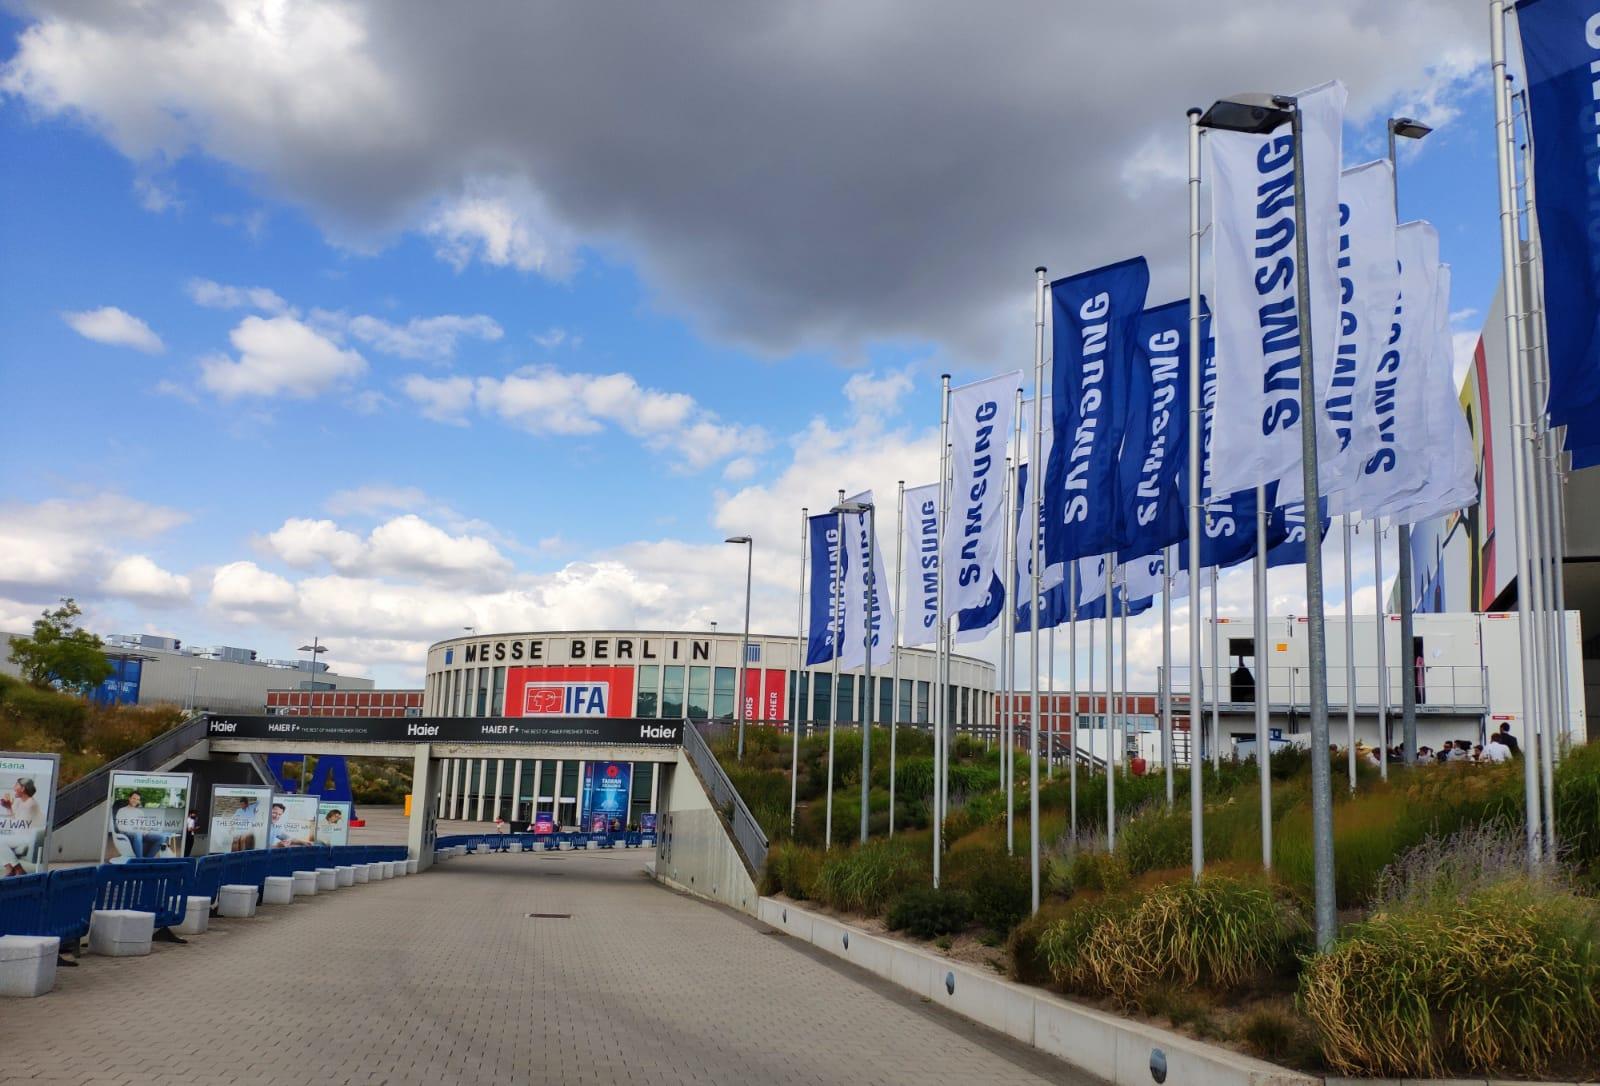 Report IFA Berlin 2019